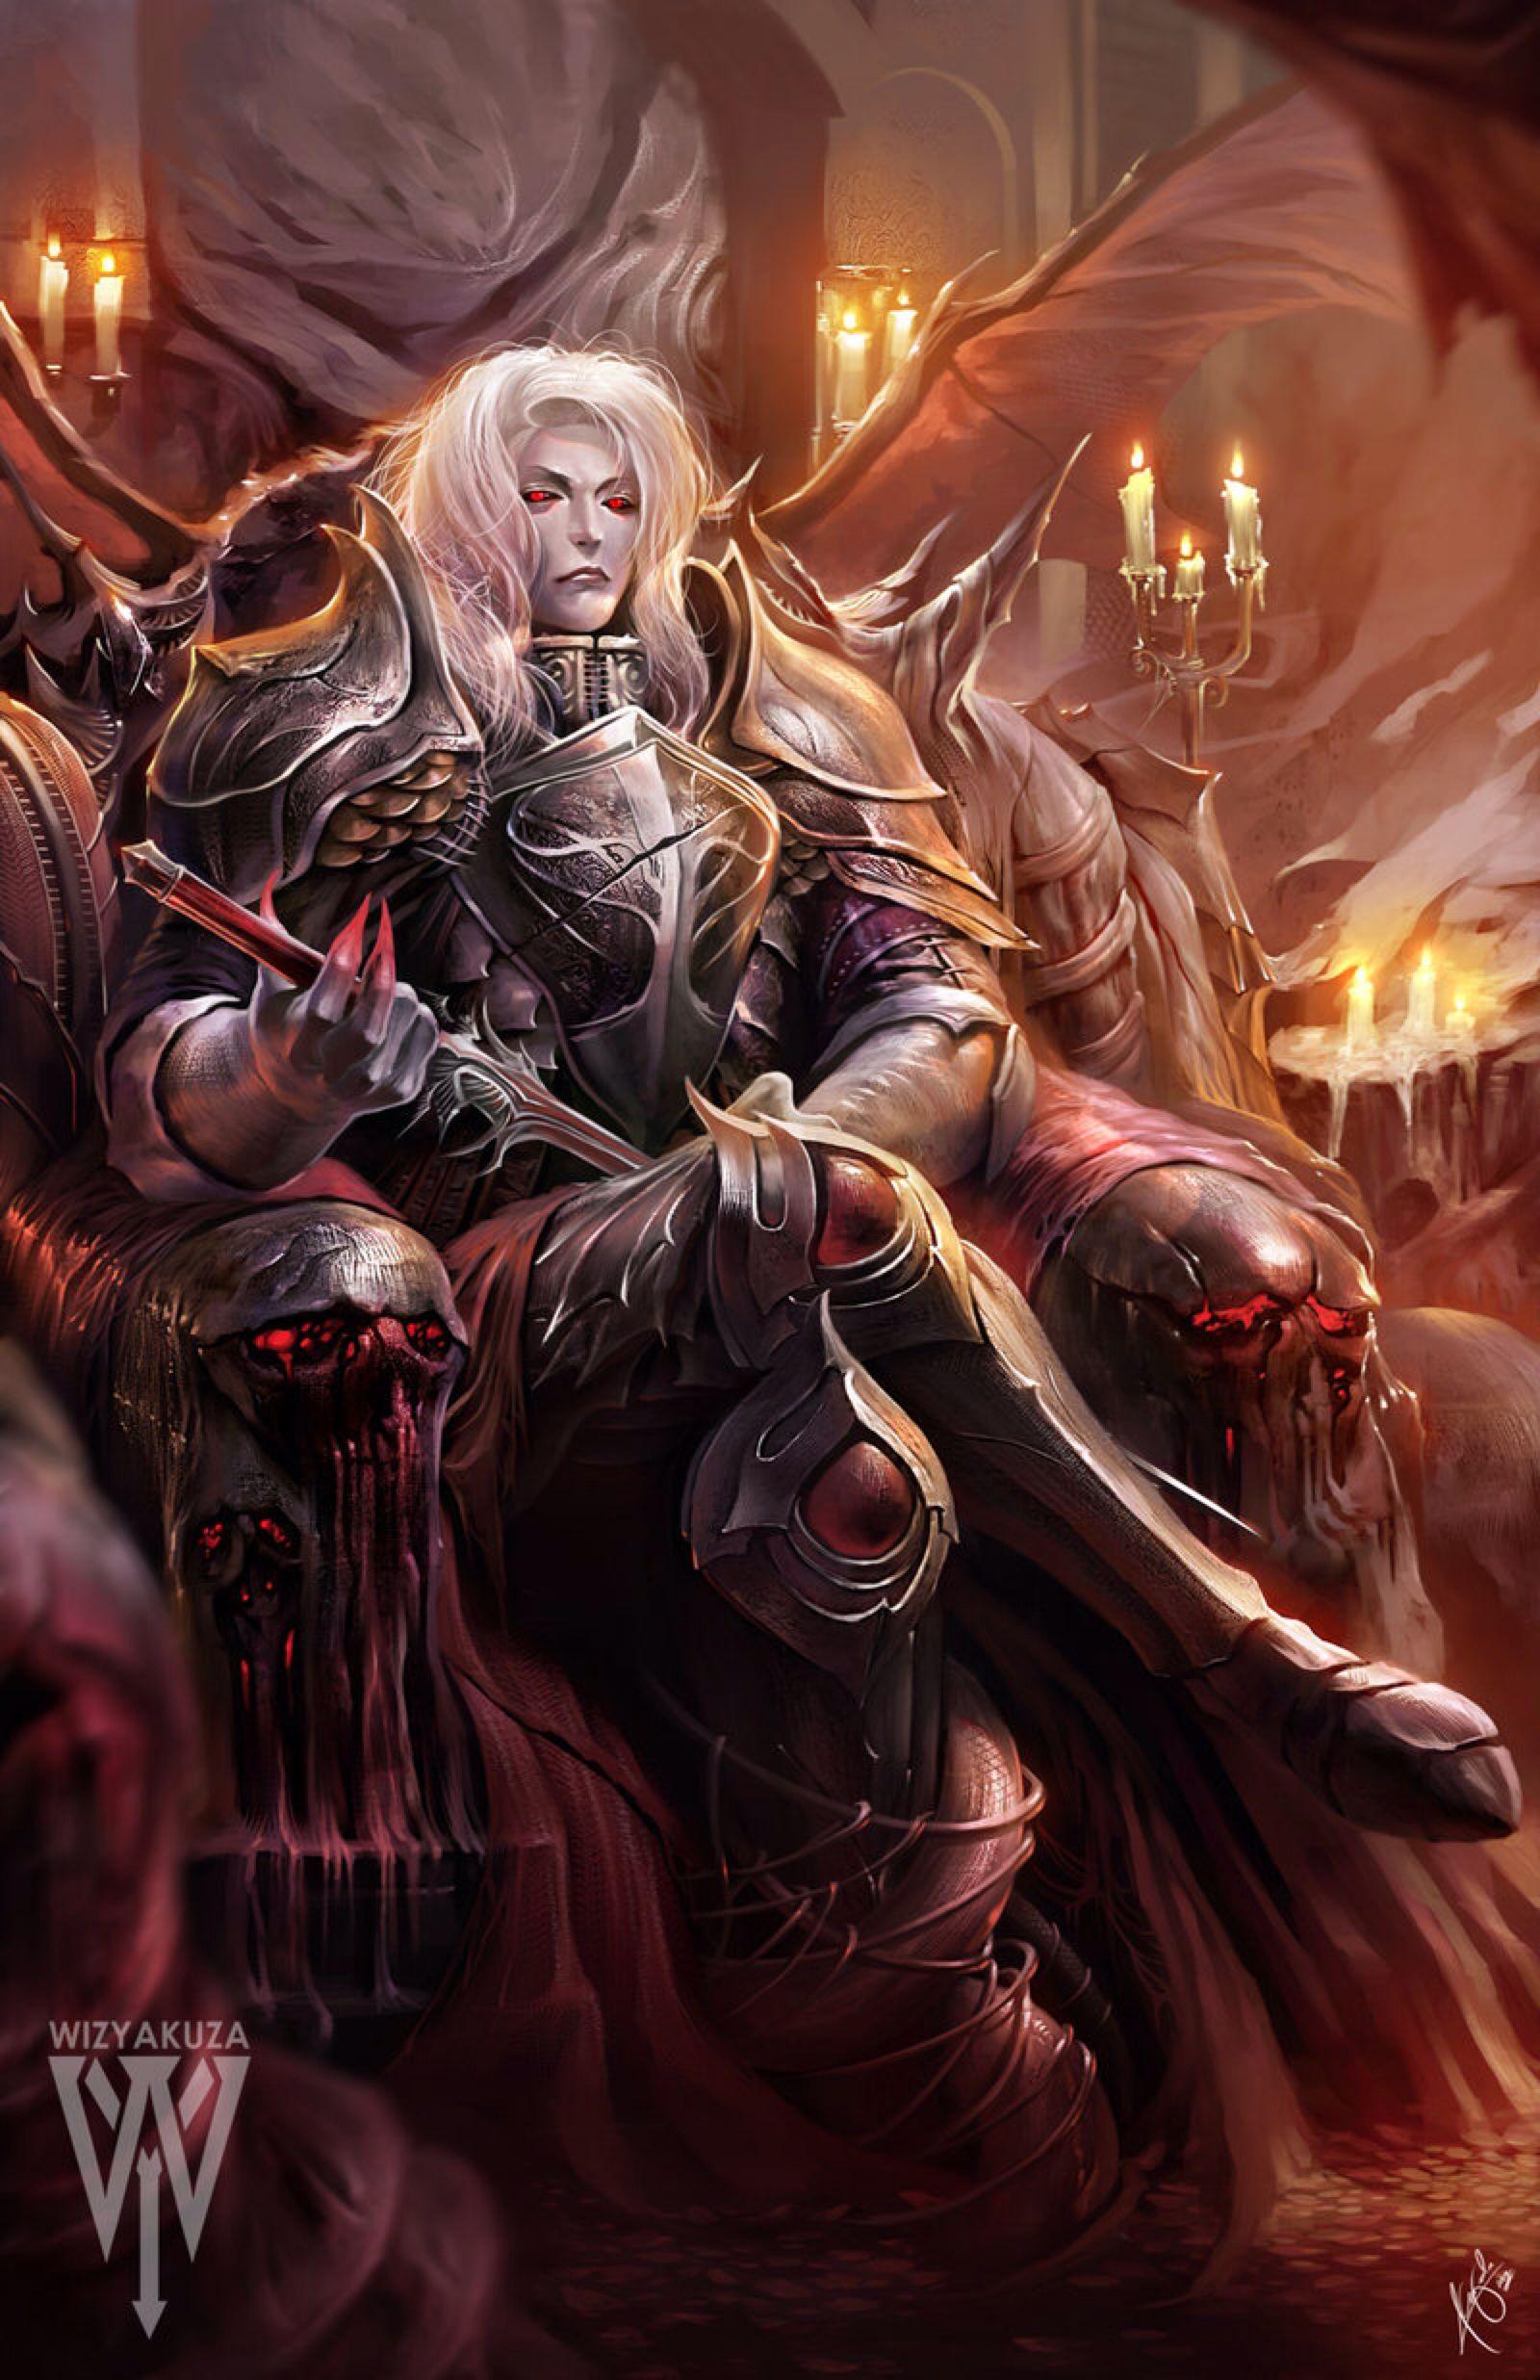 Alucard by wizyakuza on @DeviantArt #Castlevania | Sci-Fi